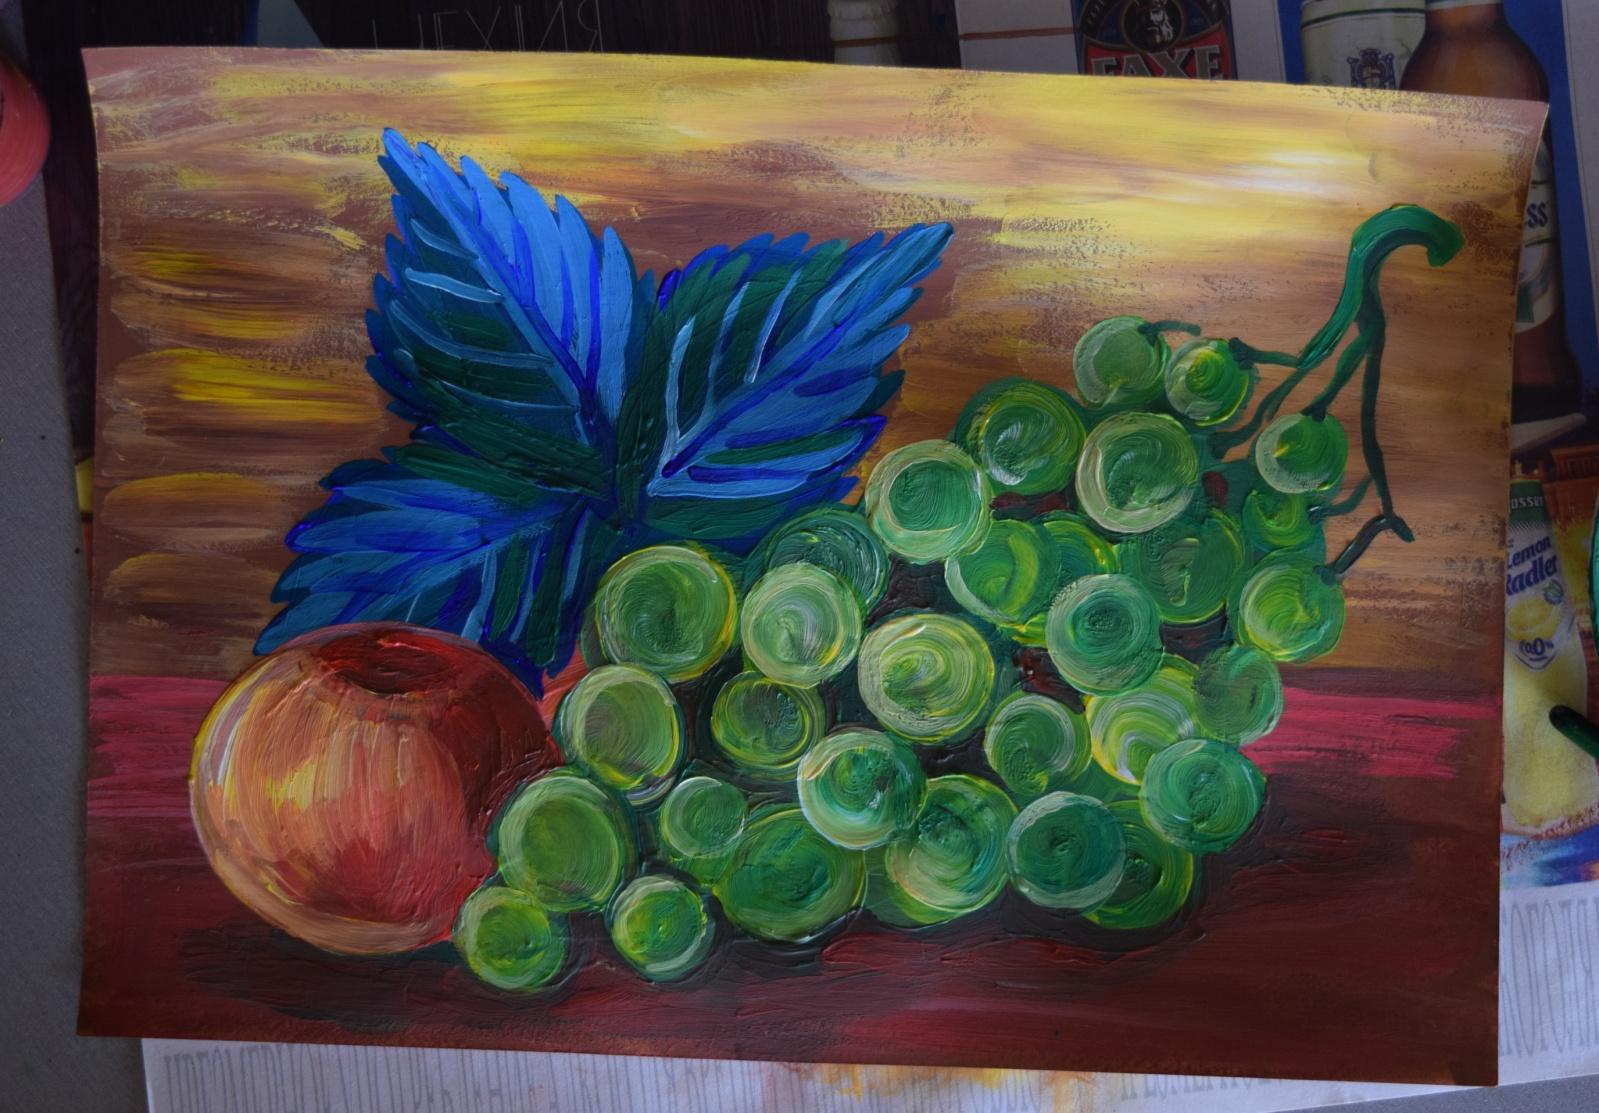 картинка натюрморт пошагово яблоко виноград гатчинский парк отрада